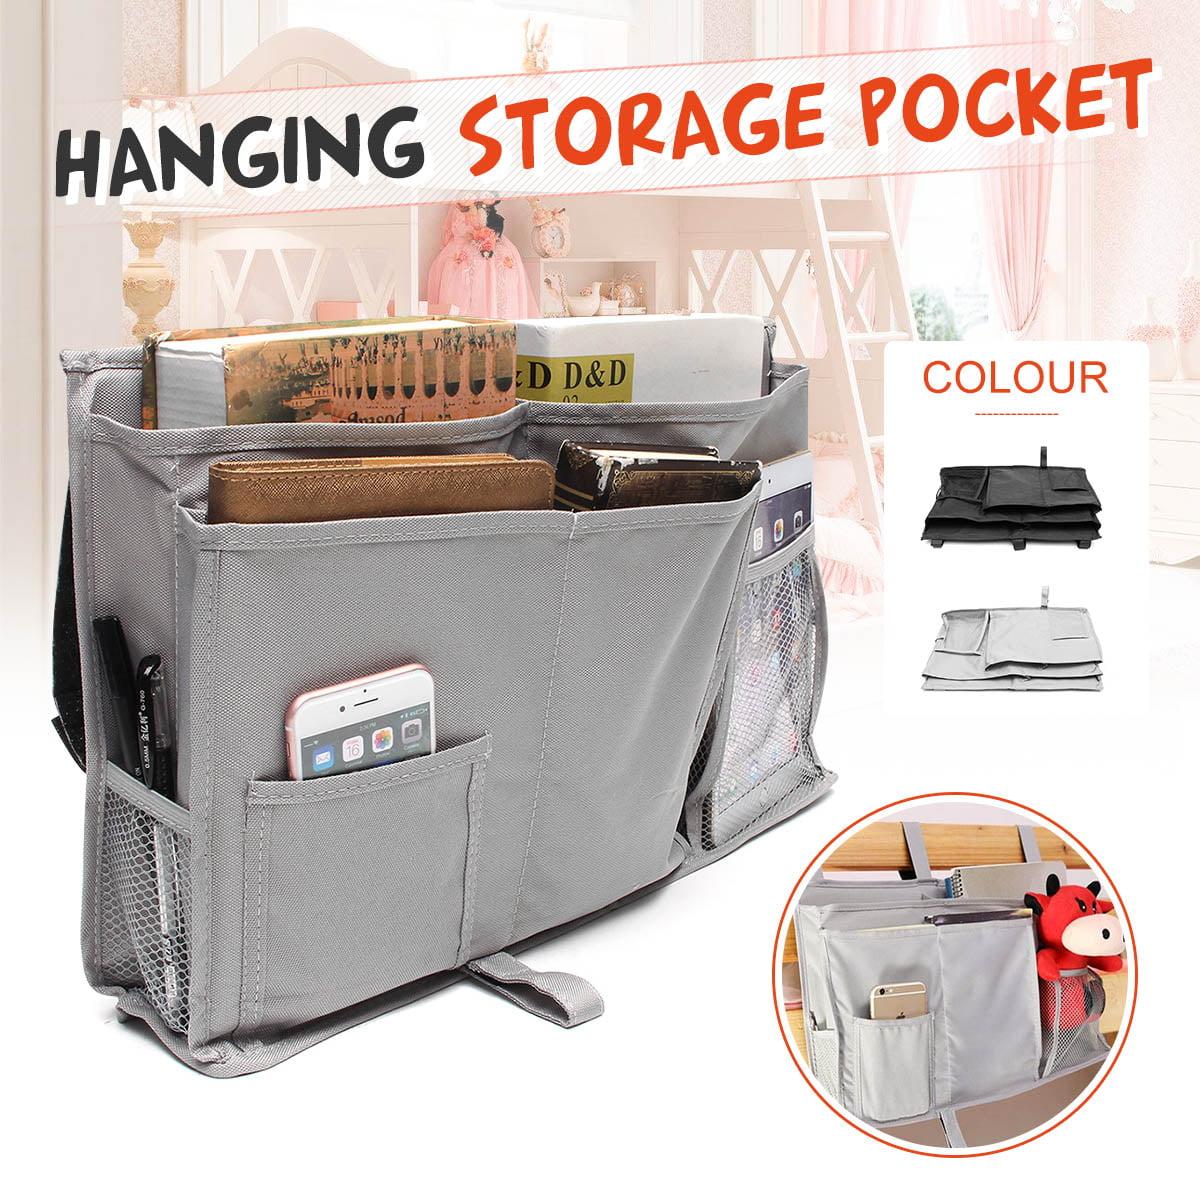 50x30cm/ 19.69x11.81'' Bedside Hanging Storage Home Decor Pocket Organizer Holder Cabin Chair Shelf Bunk Baby Bed Storage Boxes